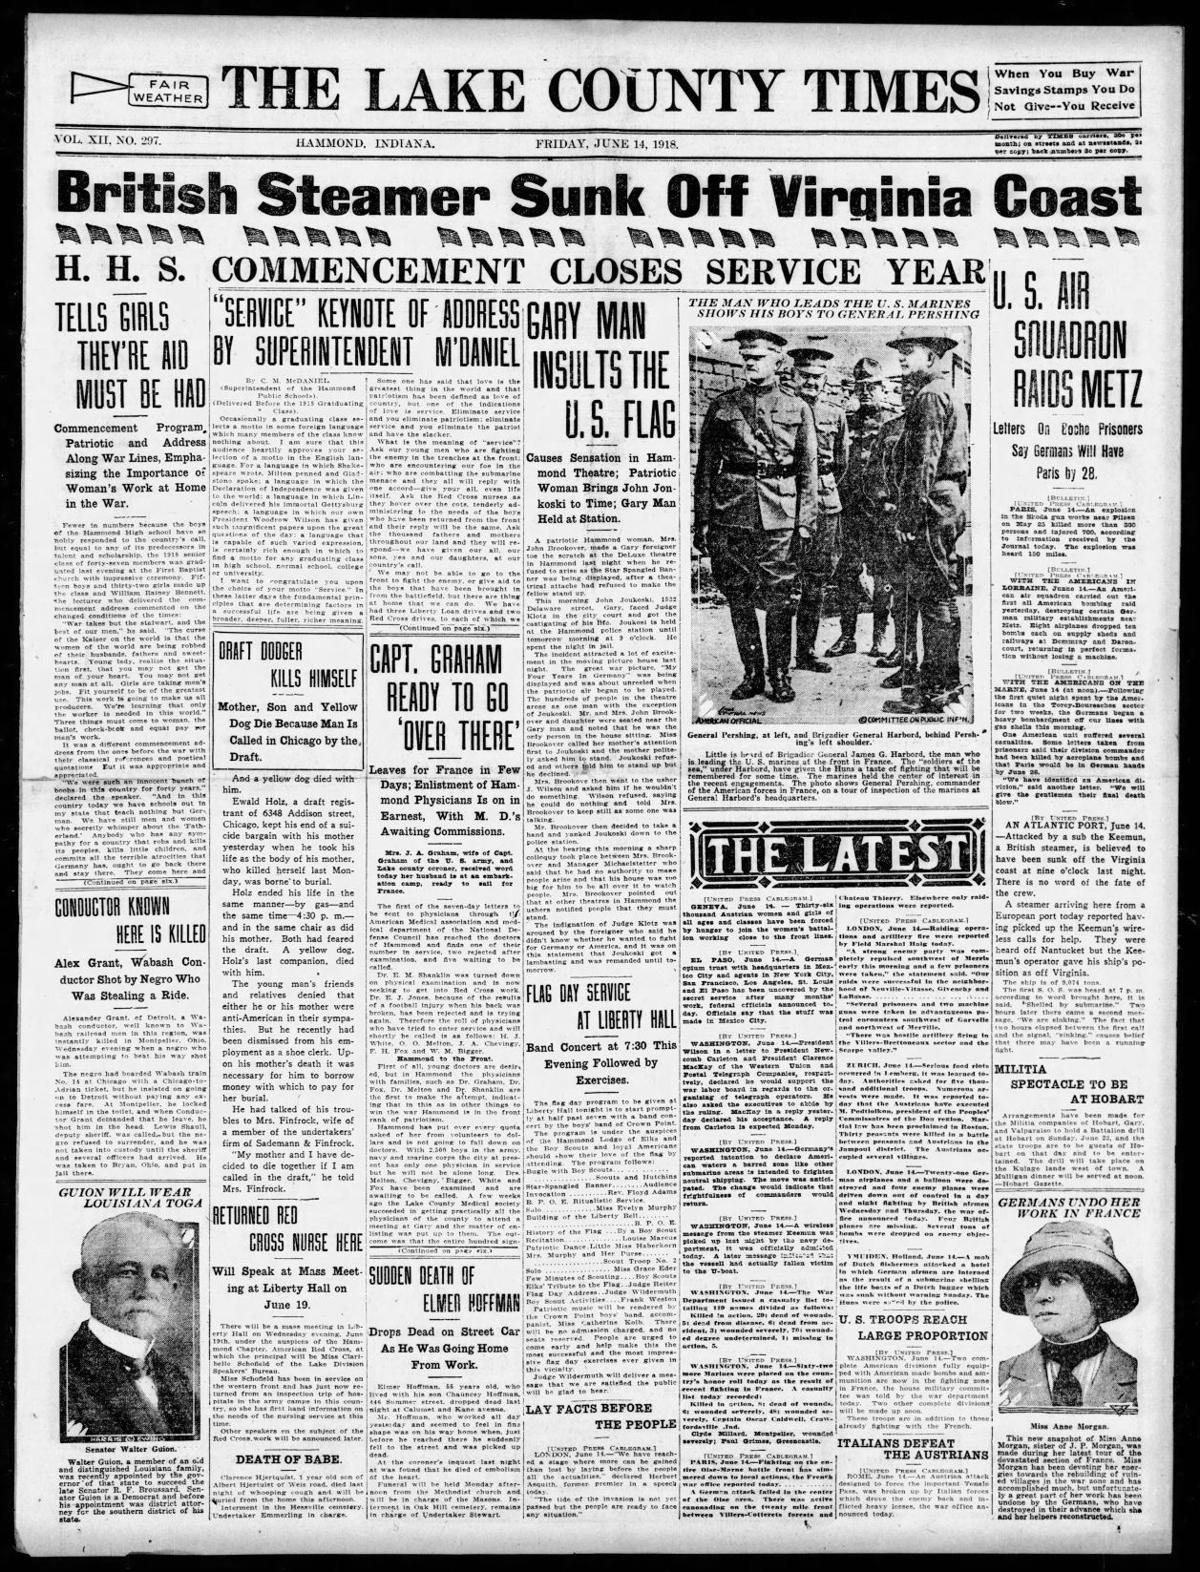 June 14, 1918: Gary Man Insults The U.S. Flag